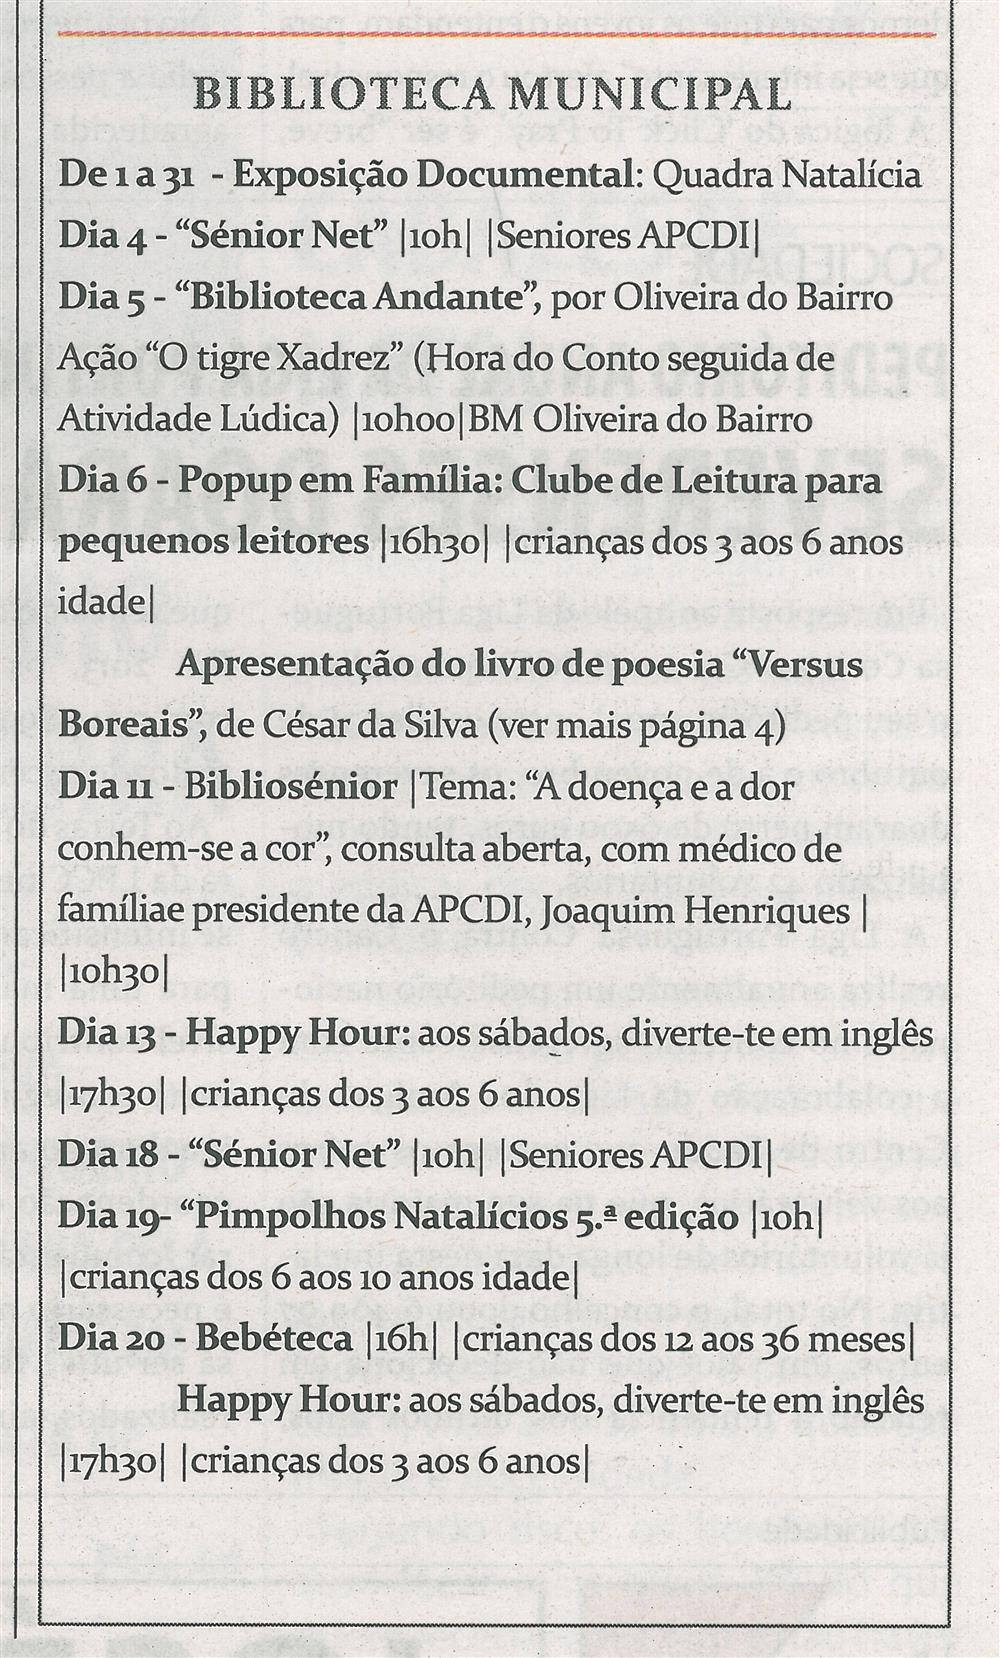 TV-dez.'14-p.15-Cultura : dezembro : Biblioteca Municipal.jpg